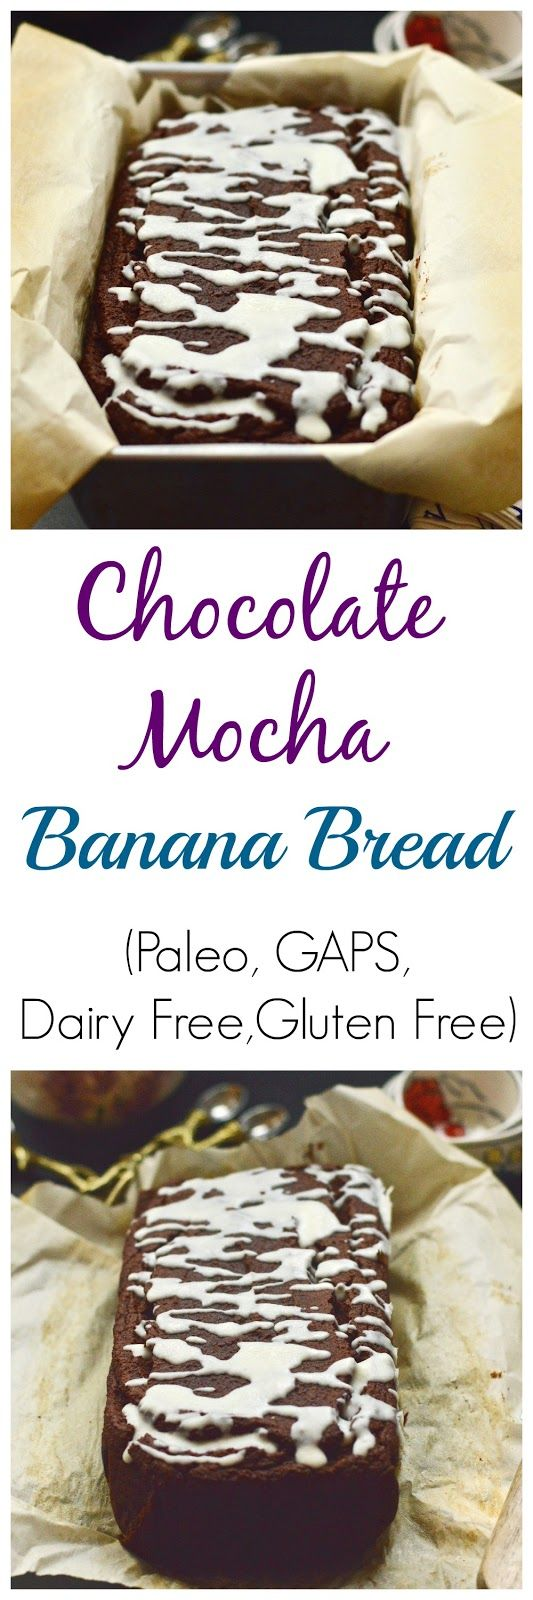 Pure and Simple Nourishment : Chocolate Mocha Banana Bread (Paleo, GAPS, Gluten Free, Dairy Free)